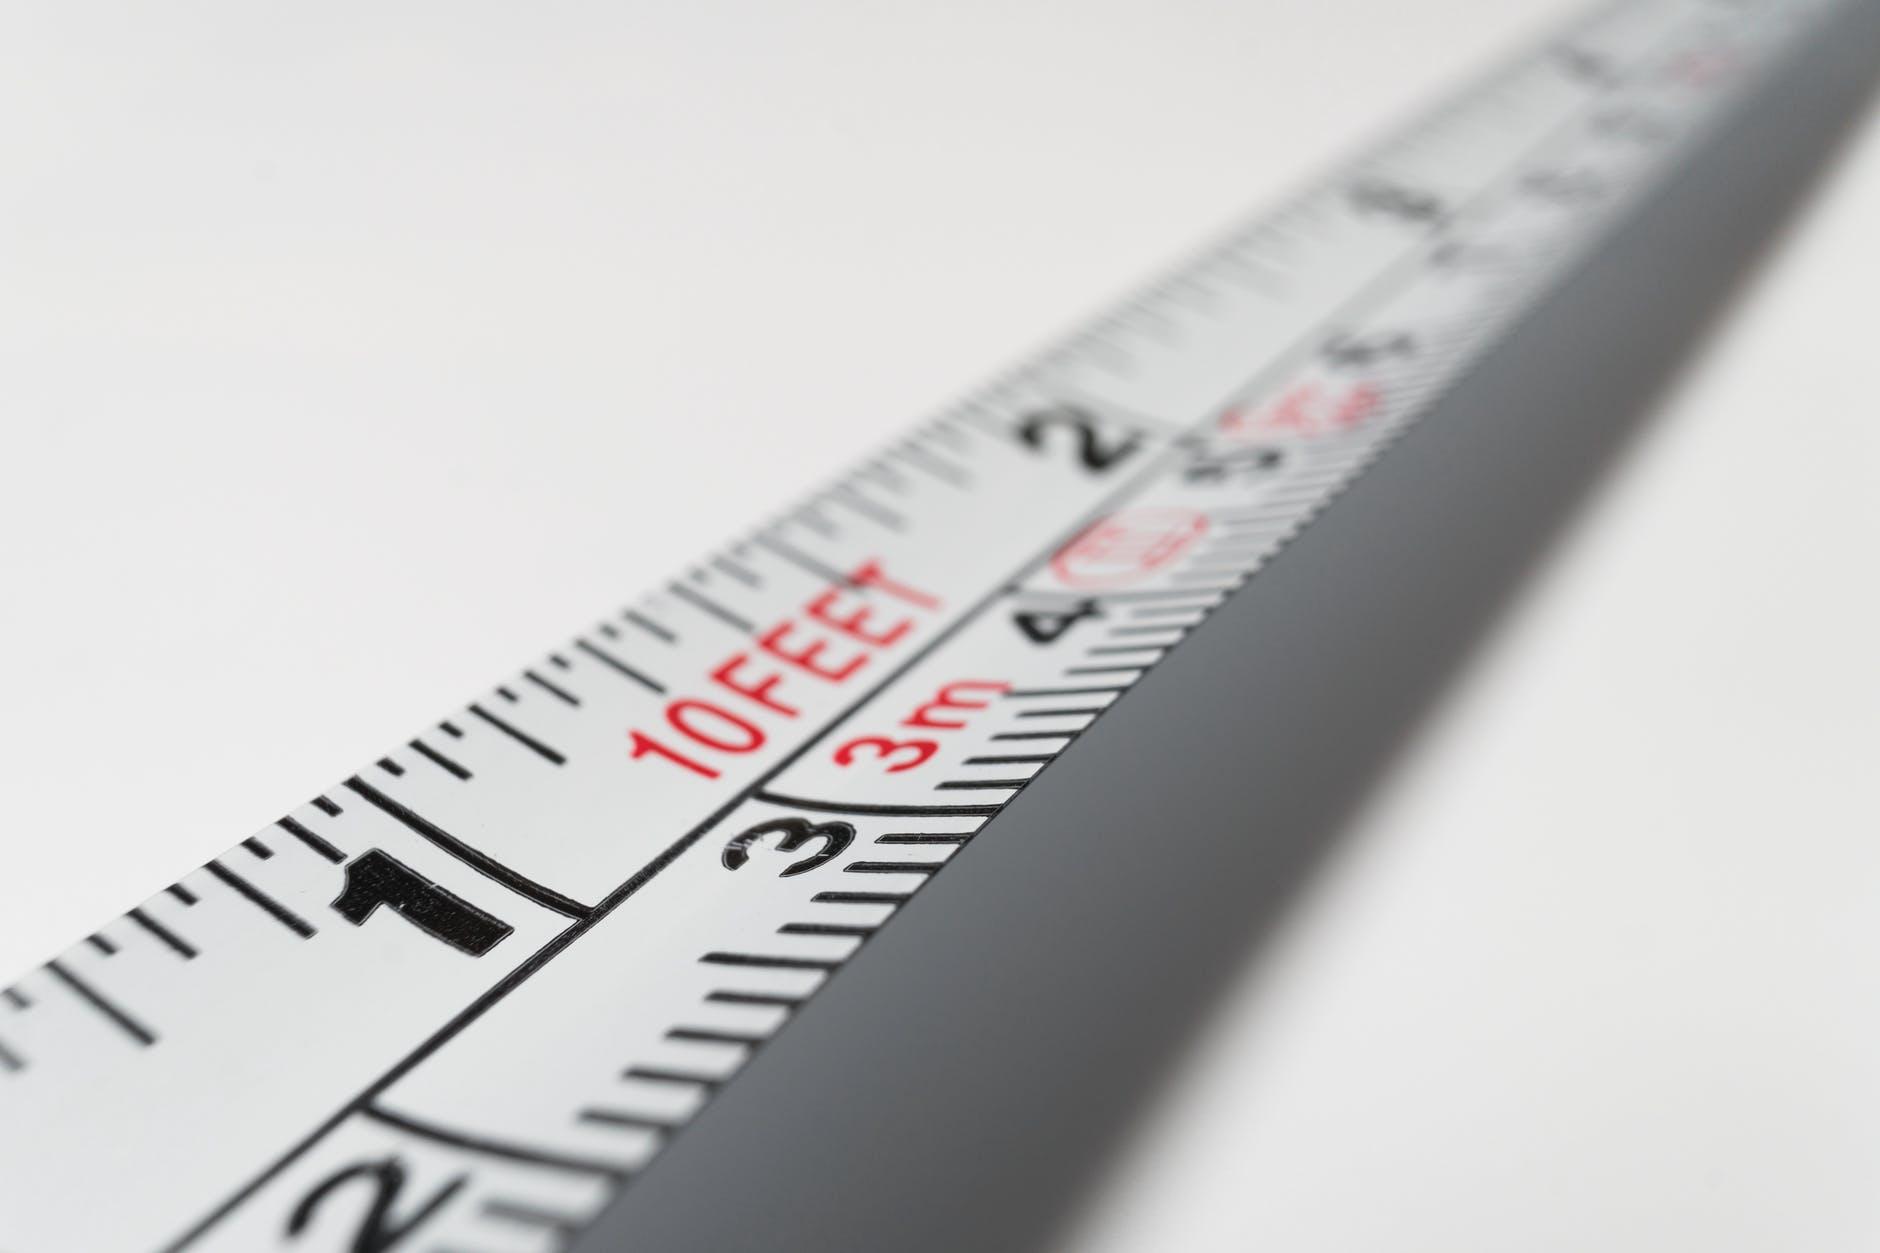 measurement-millimeter-centimeter-meter-162500.jpeg